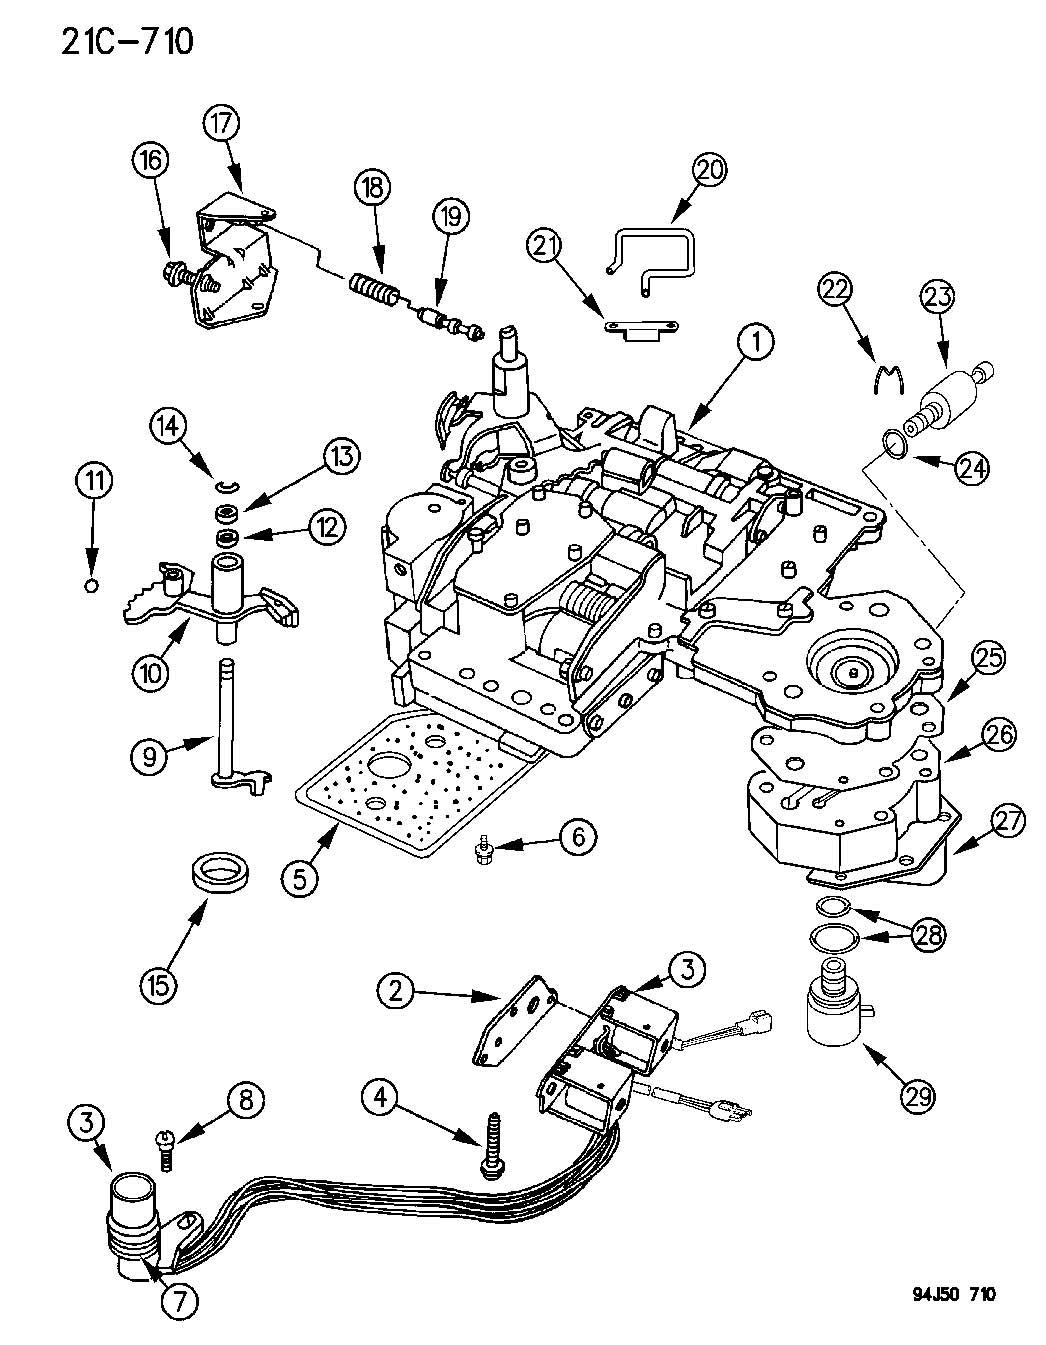 2002 buick lesabre vacuum hose diagram in addition gm radio wiring 32 pin connector diagram moreover